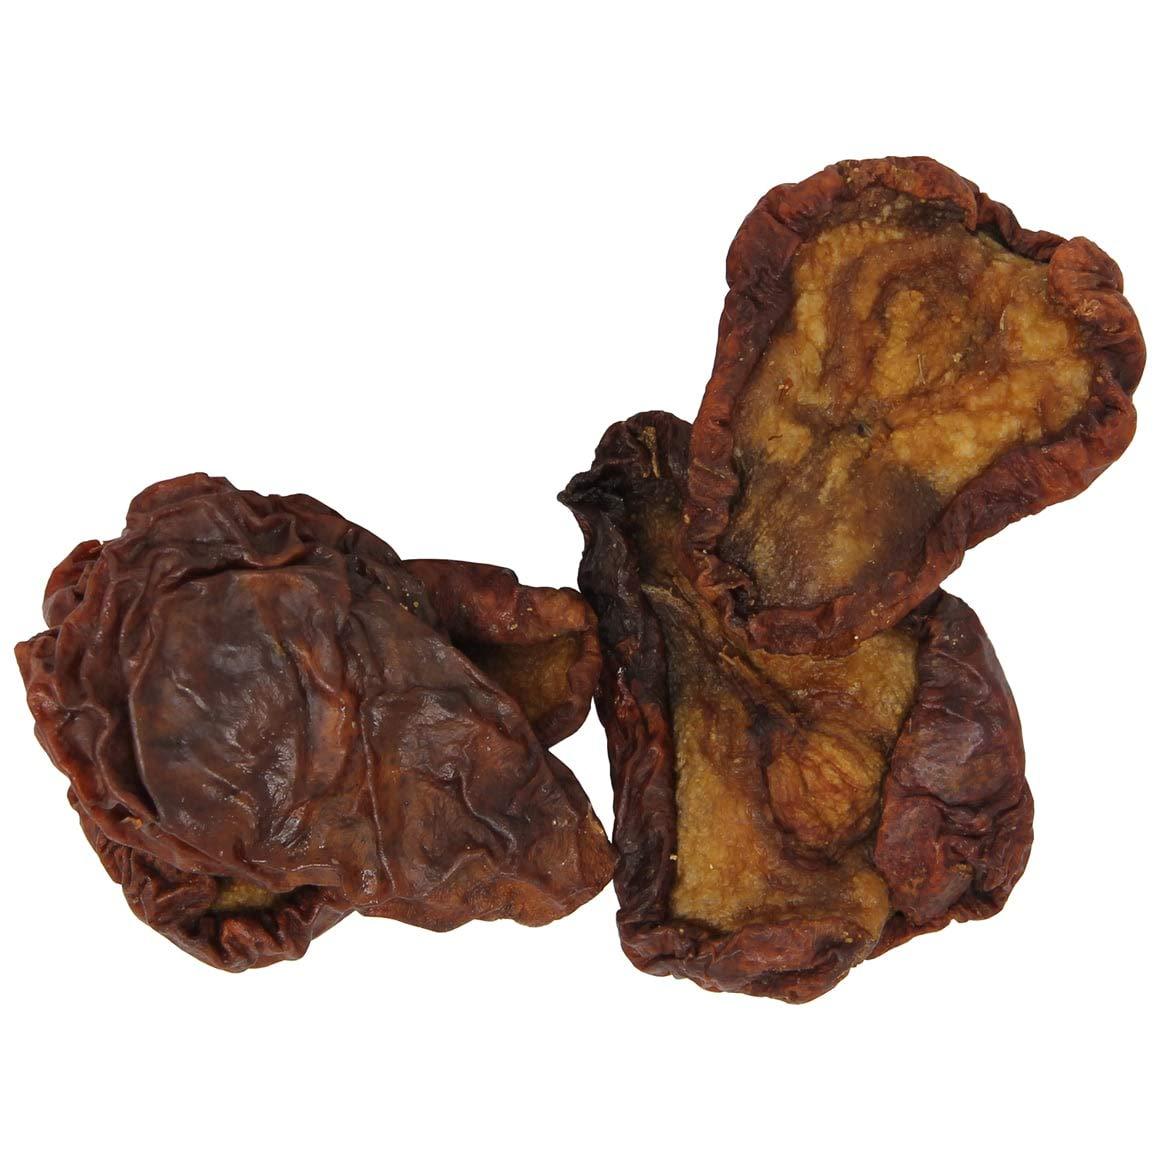 Organic Pears, 5 Pounds - California Sun-Dried Pear Halves, Non-GMO, Kosher, Unsulfured, Unsweetened, Non-Infused, Non-Oil Added, Non-Irradiated, Vegan, Raw, Bulk